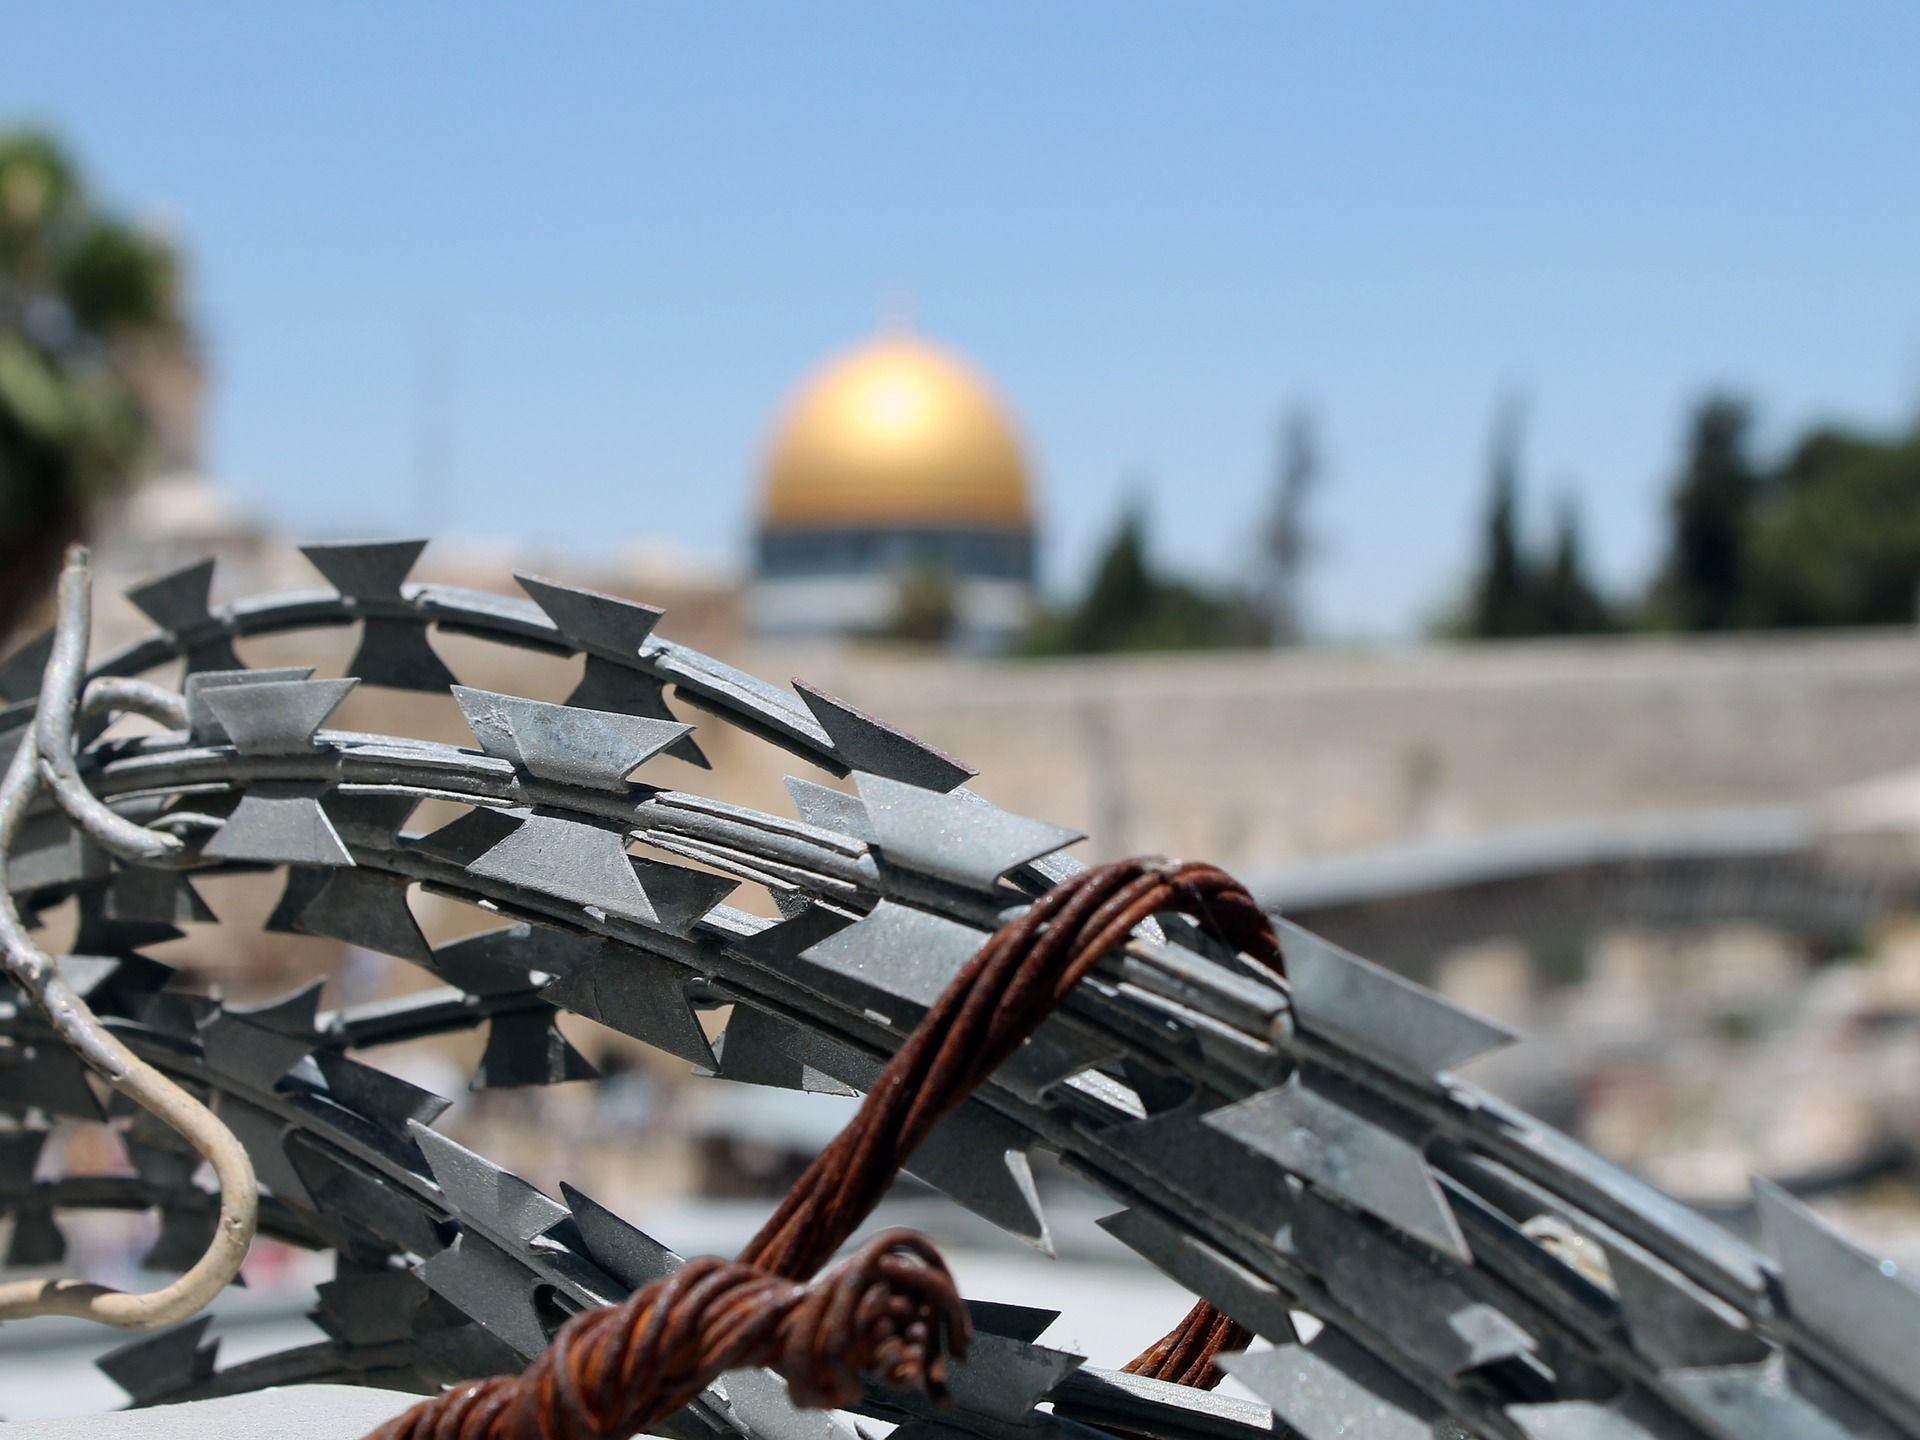 Boykottiert Israel im Monat Ramadan